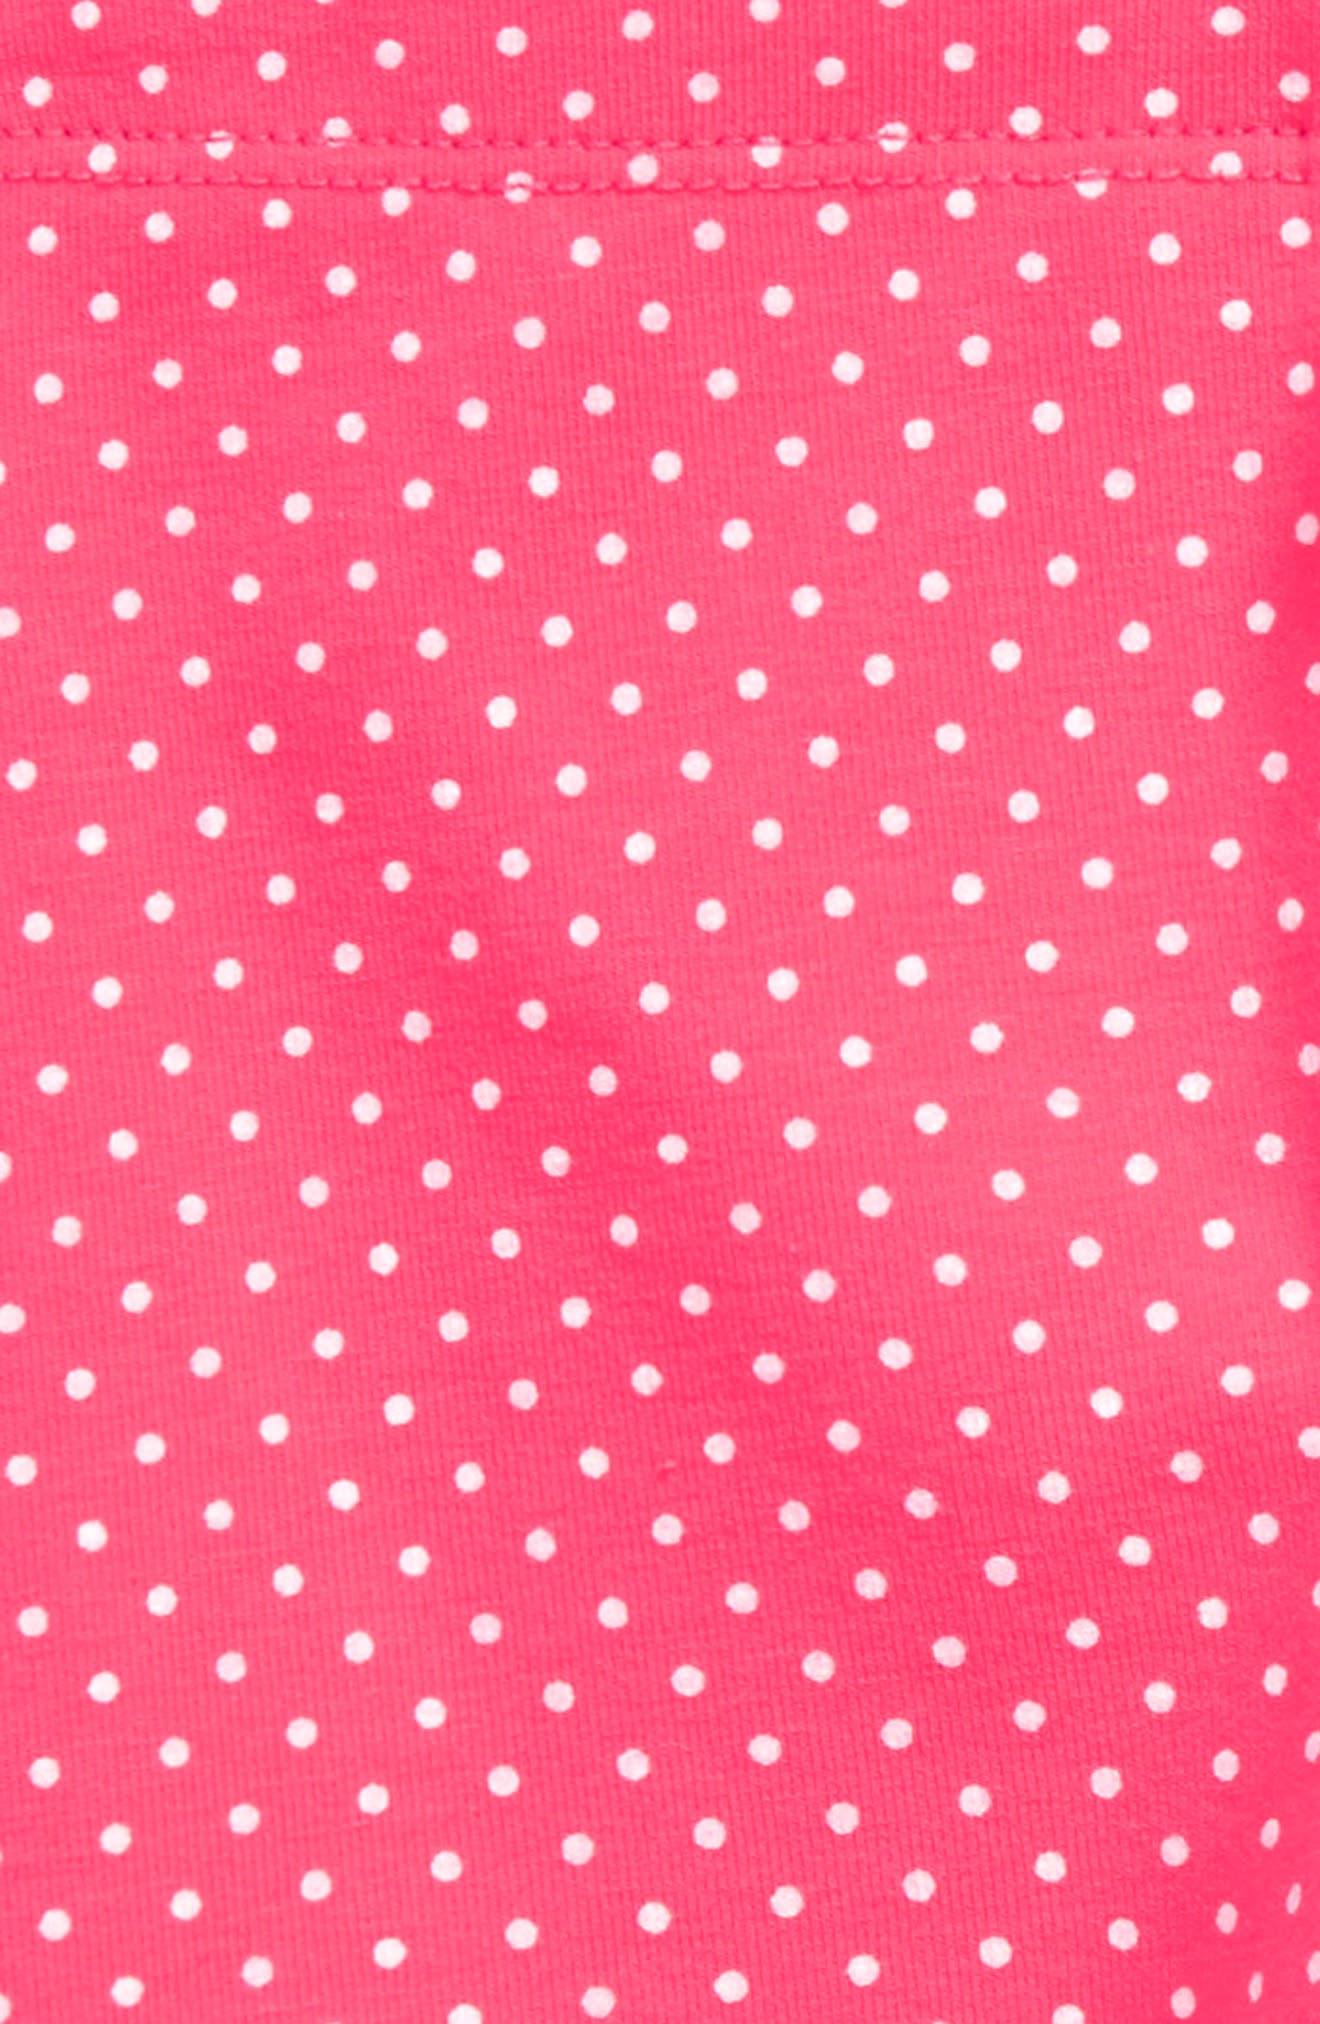 Pin Dot Leggings,                             Alternate thumbnail 2, color,                             Candy Apple